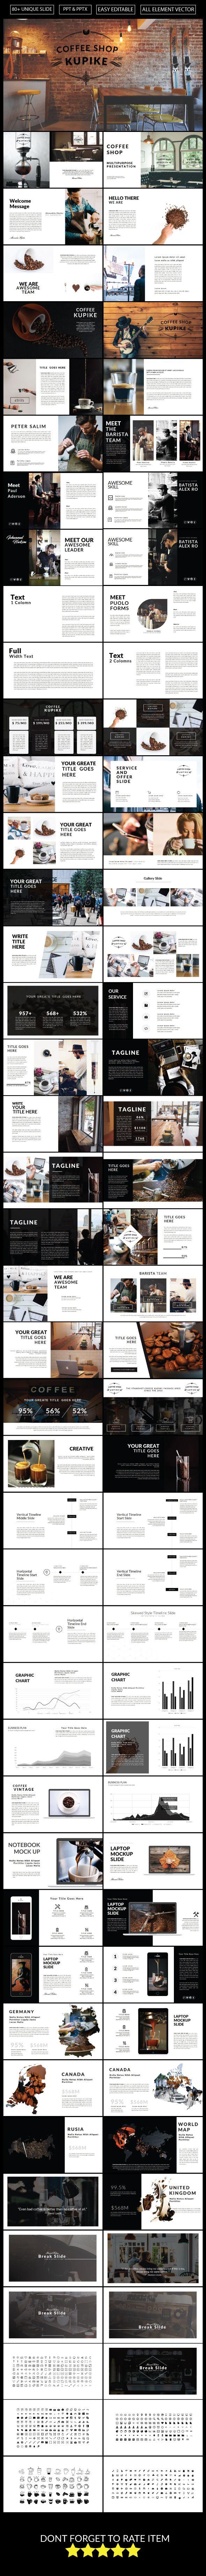 Pin by Kupike Coffee on KUPiKE coffee | Pinterest | Coffee